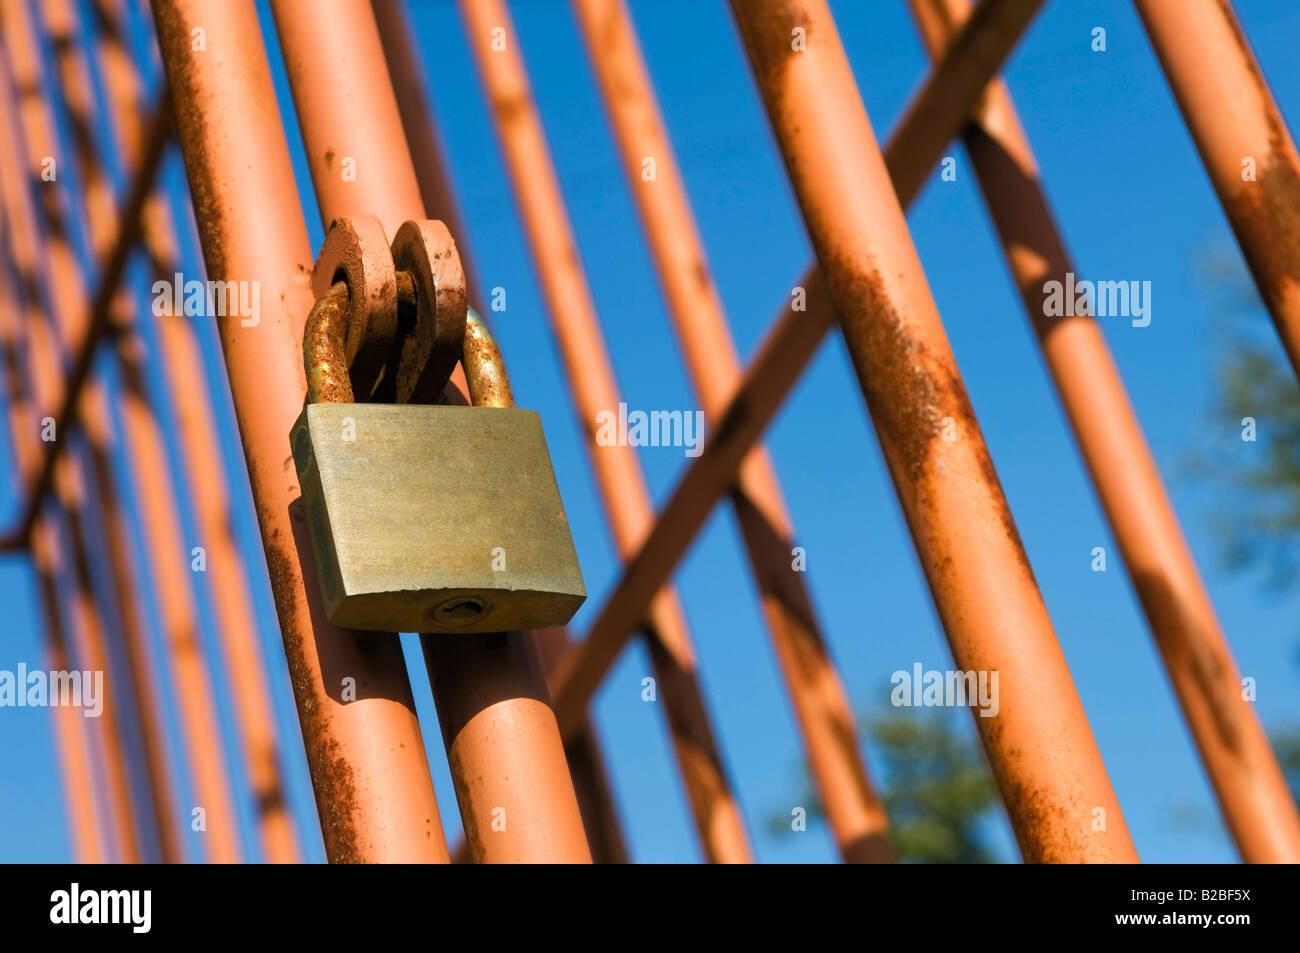 Rusty cage door with padlock & Rusty cage door with padlock Stock Photo Royalty Free Image ... Pezcame.Com